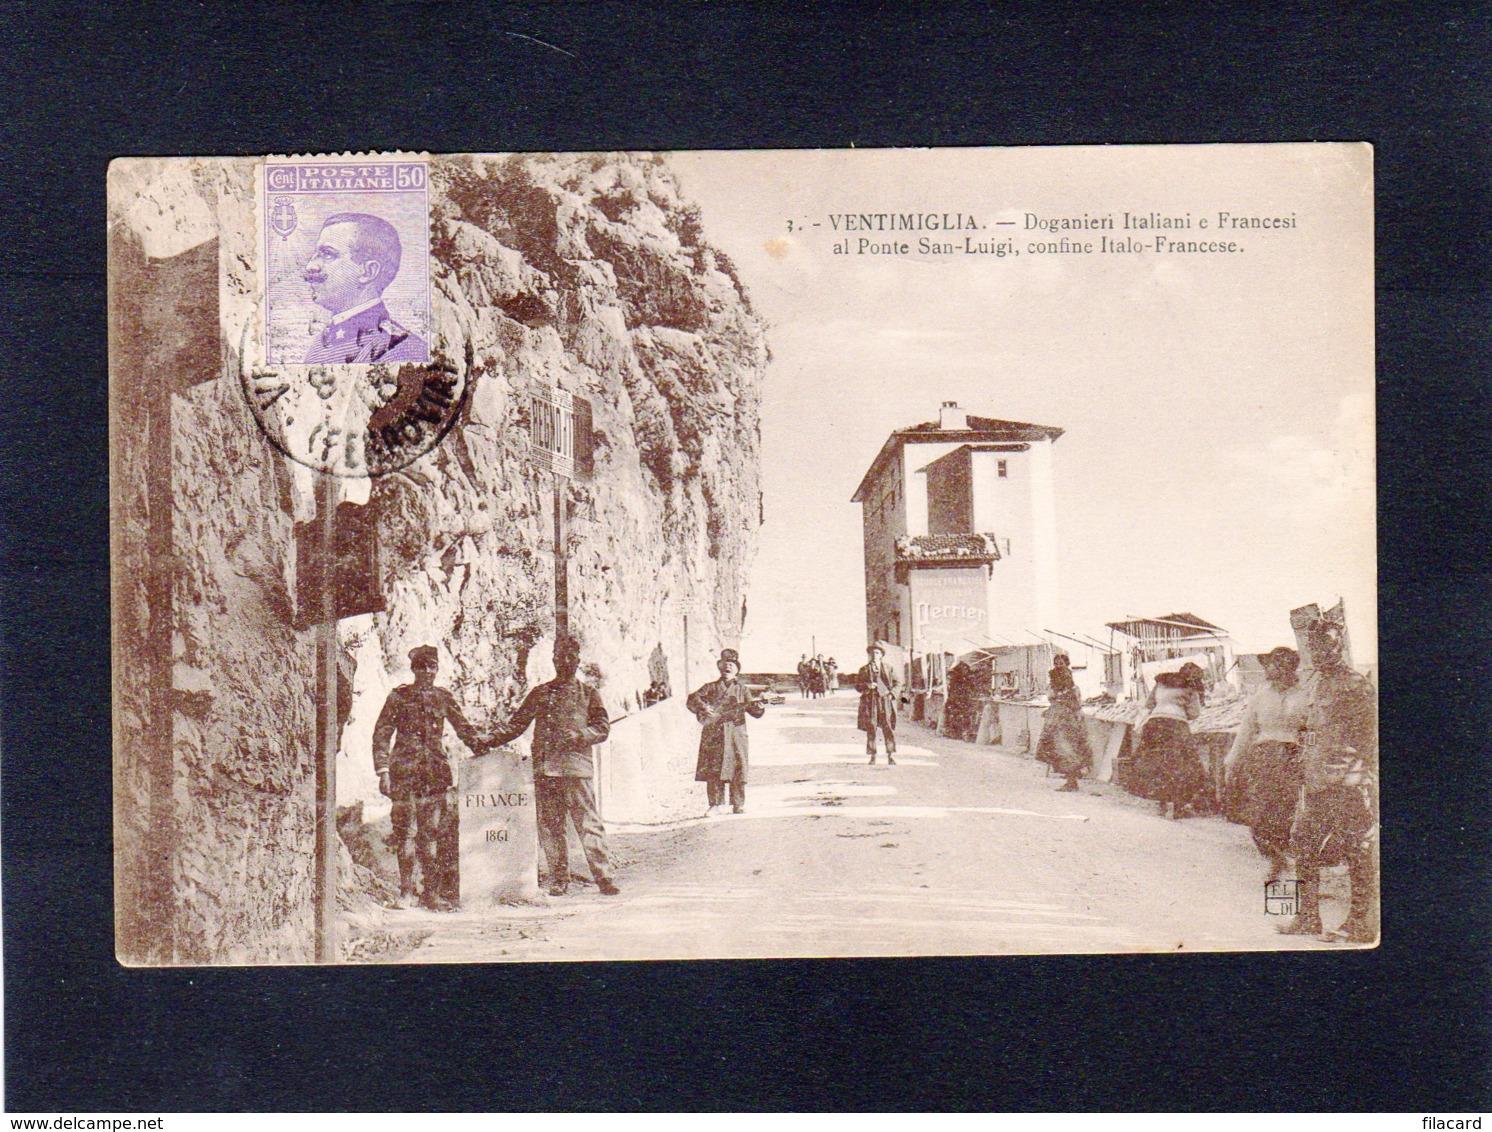 88101     Italia,  Ventimiglia,  Doganieri  Italiani E  Francesi Al  Ponte San-Luigi,  Confine Italo-Francese,  VG  1918 - Imperia